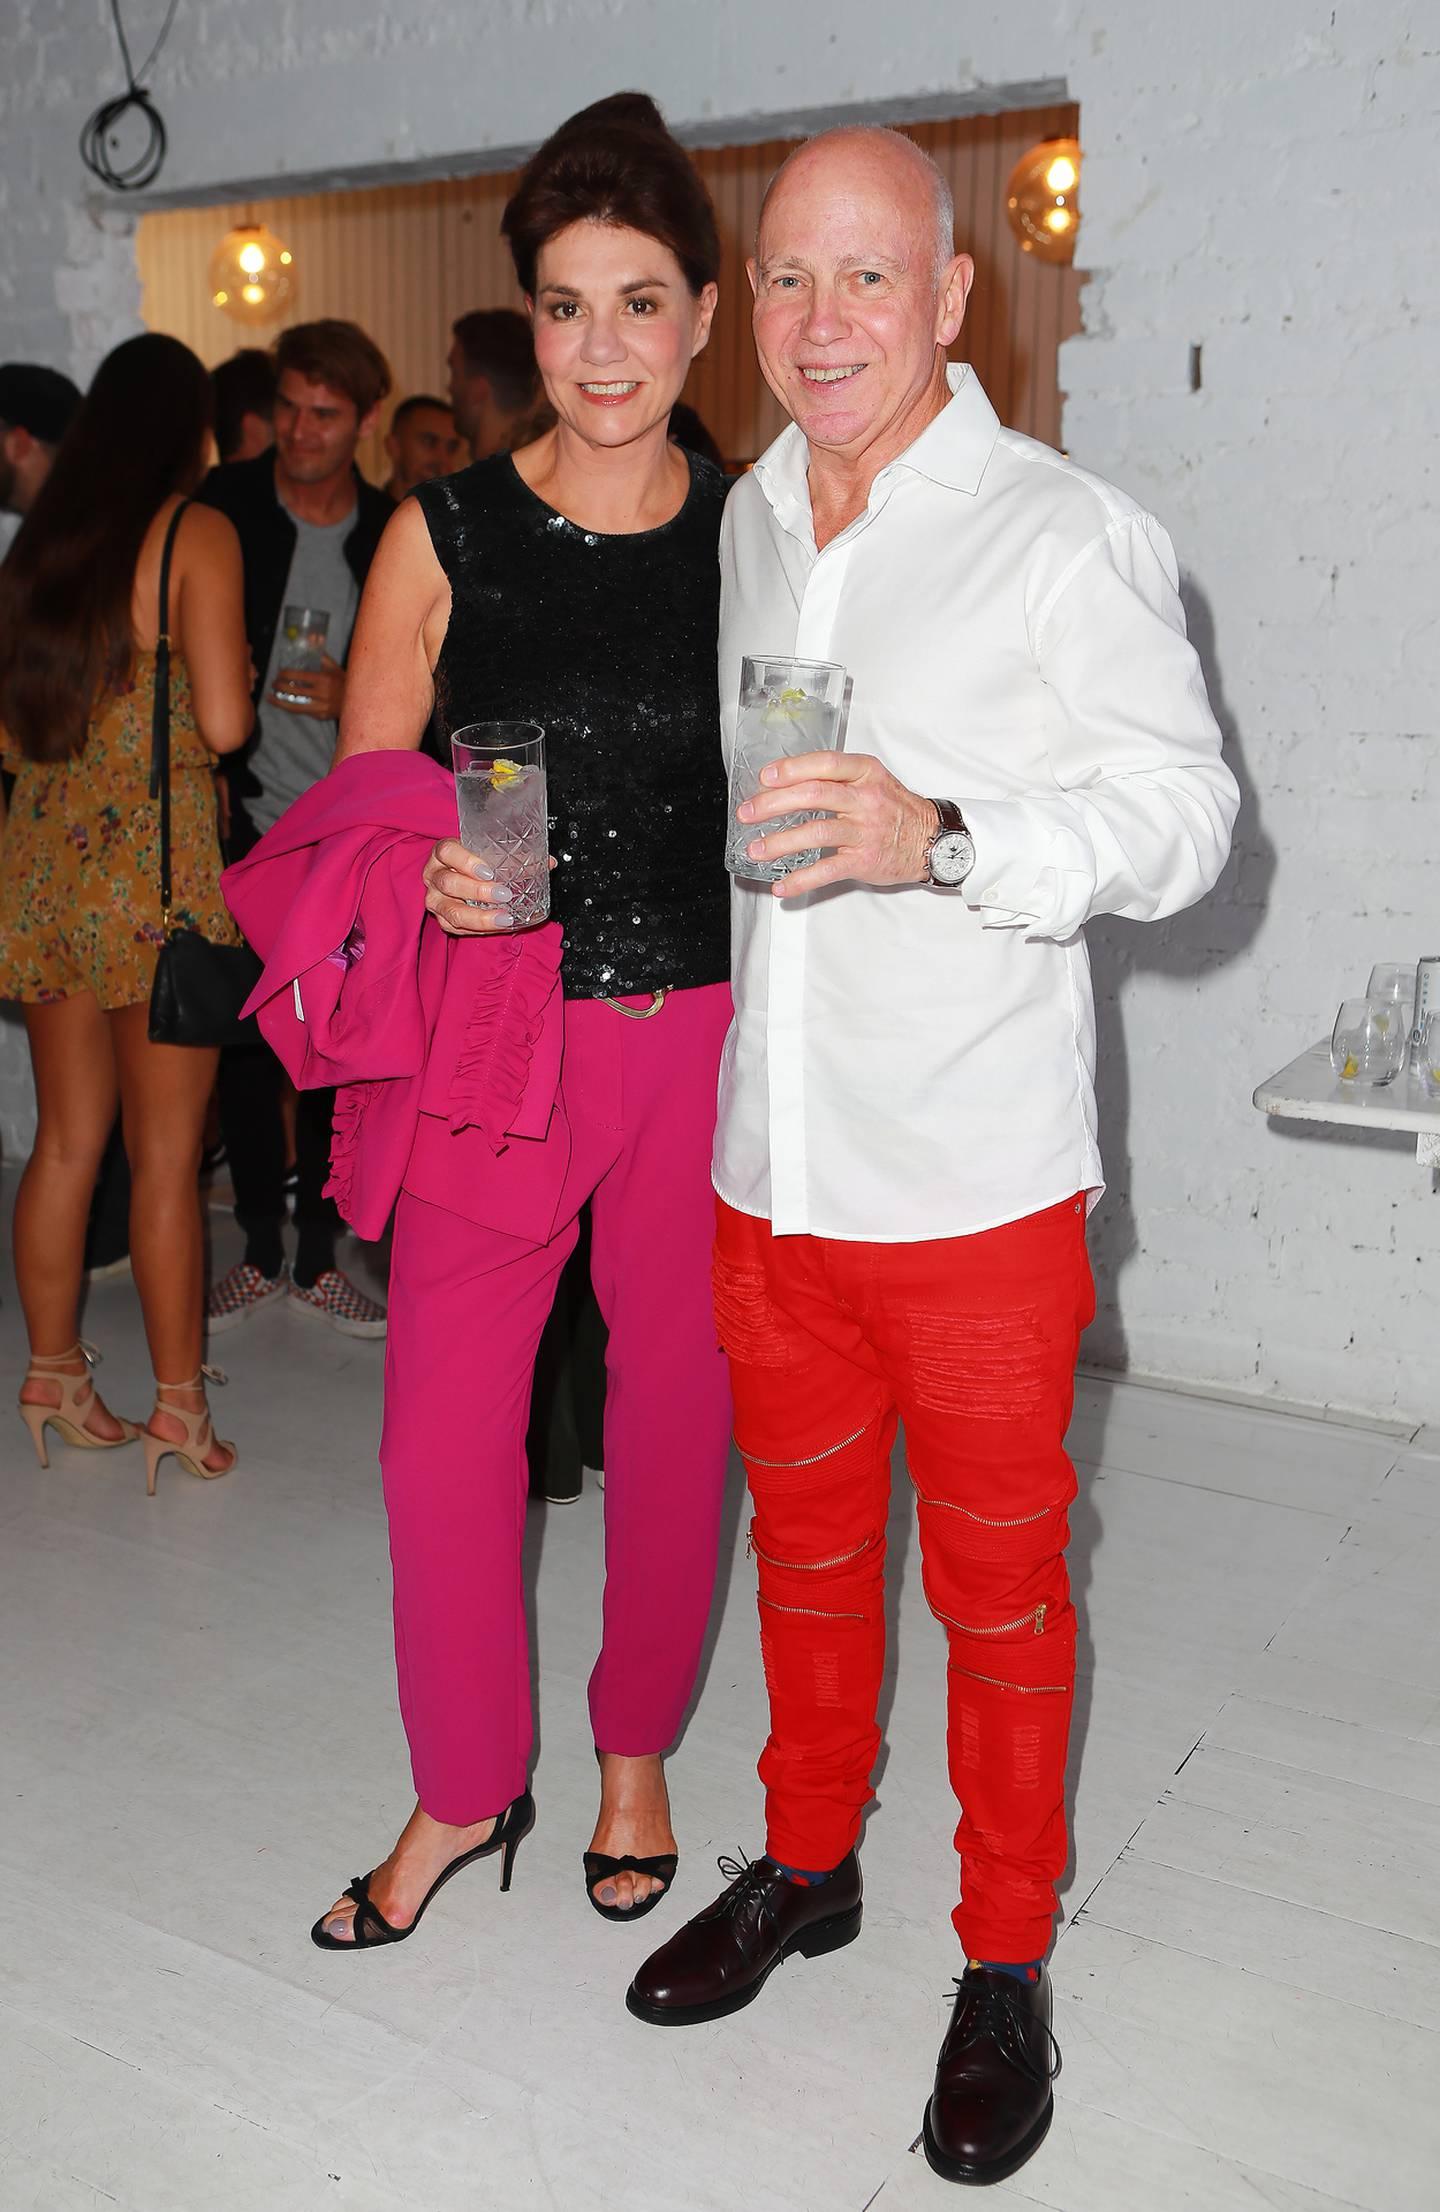 Pauline Hanna and Philip Polkinghorne in 2018. Photo / NZME